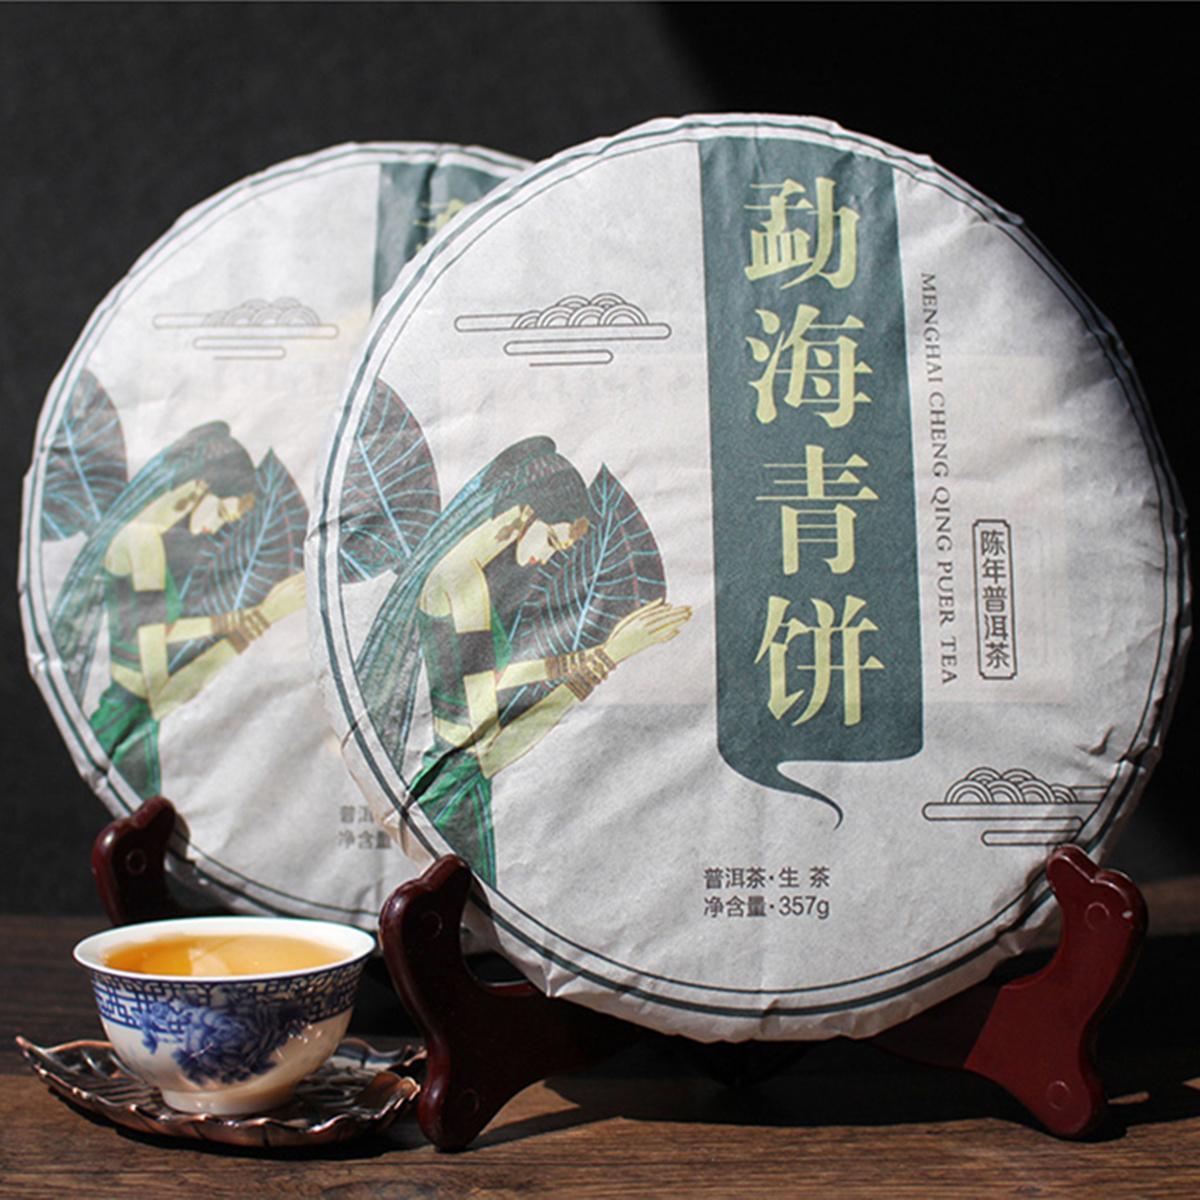 357g Crudo Pu Er Tea Meng Hai Pu er Tea Cake PuOrer organico Puer verde Il più vecchio albero Pu erh naturale Puerh Black Puerh Tea Cake Vendite dirette della fabbrica